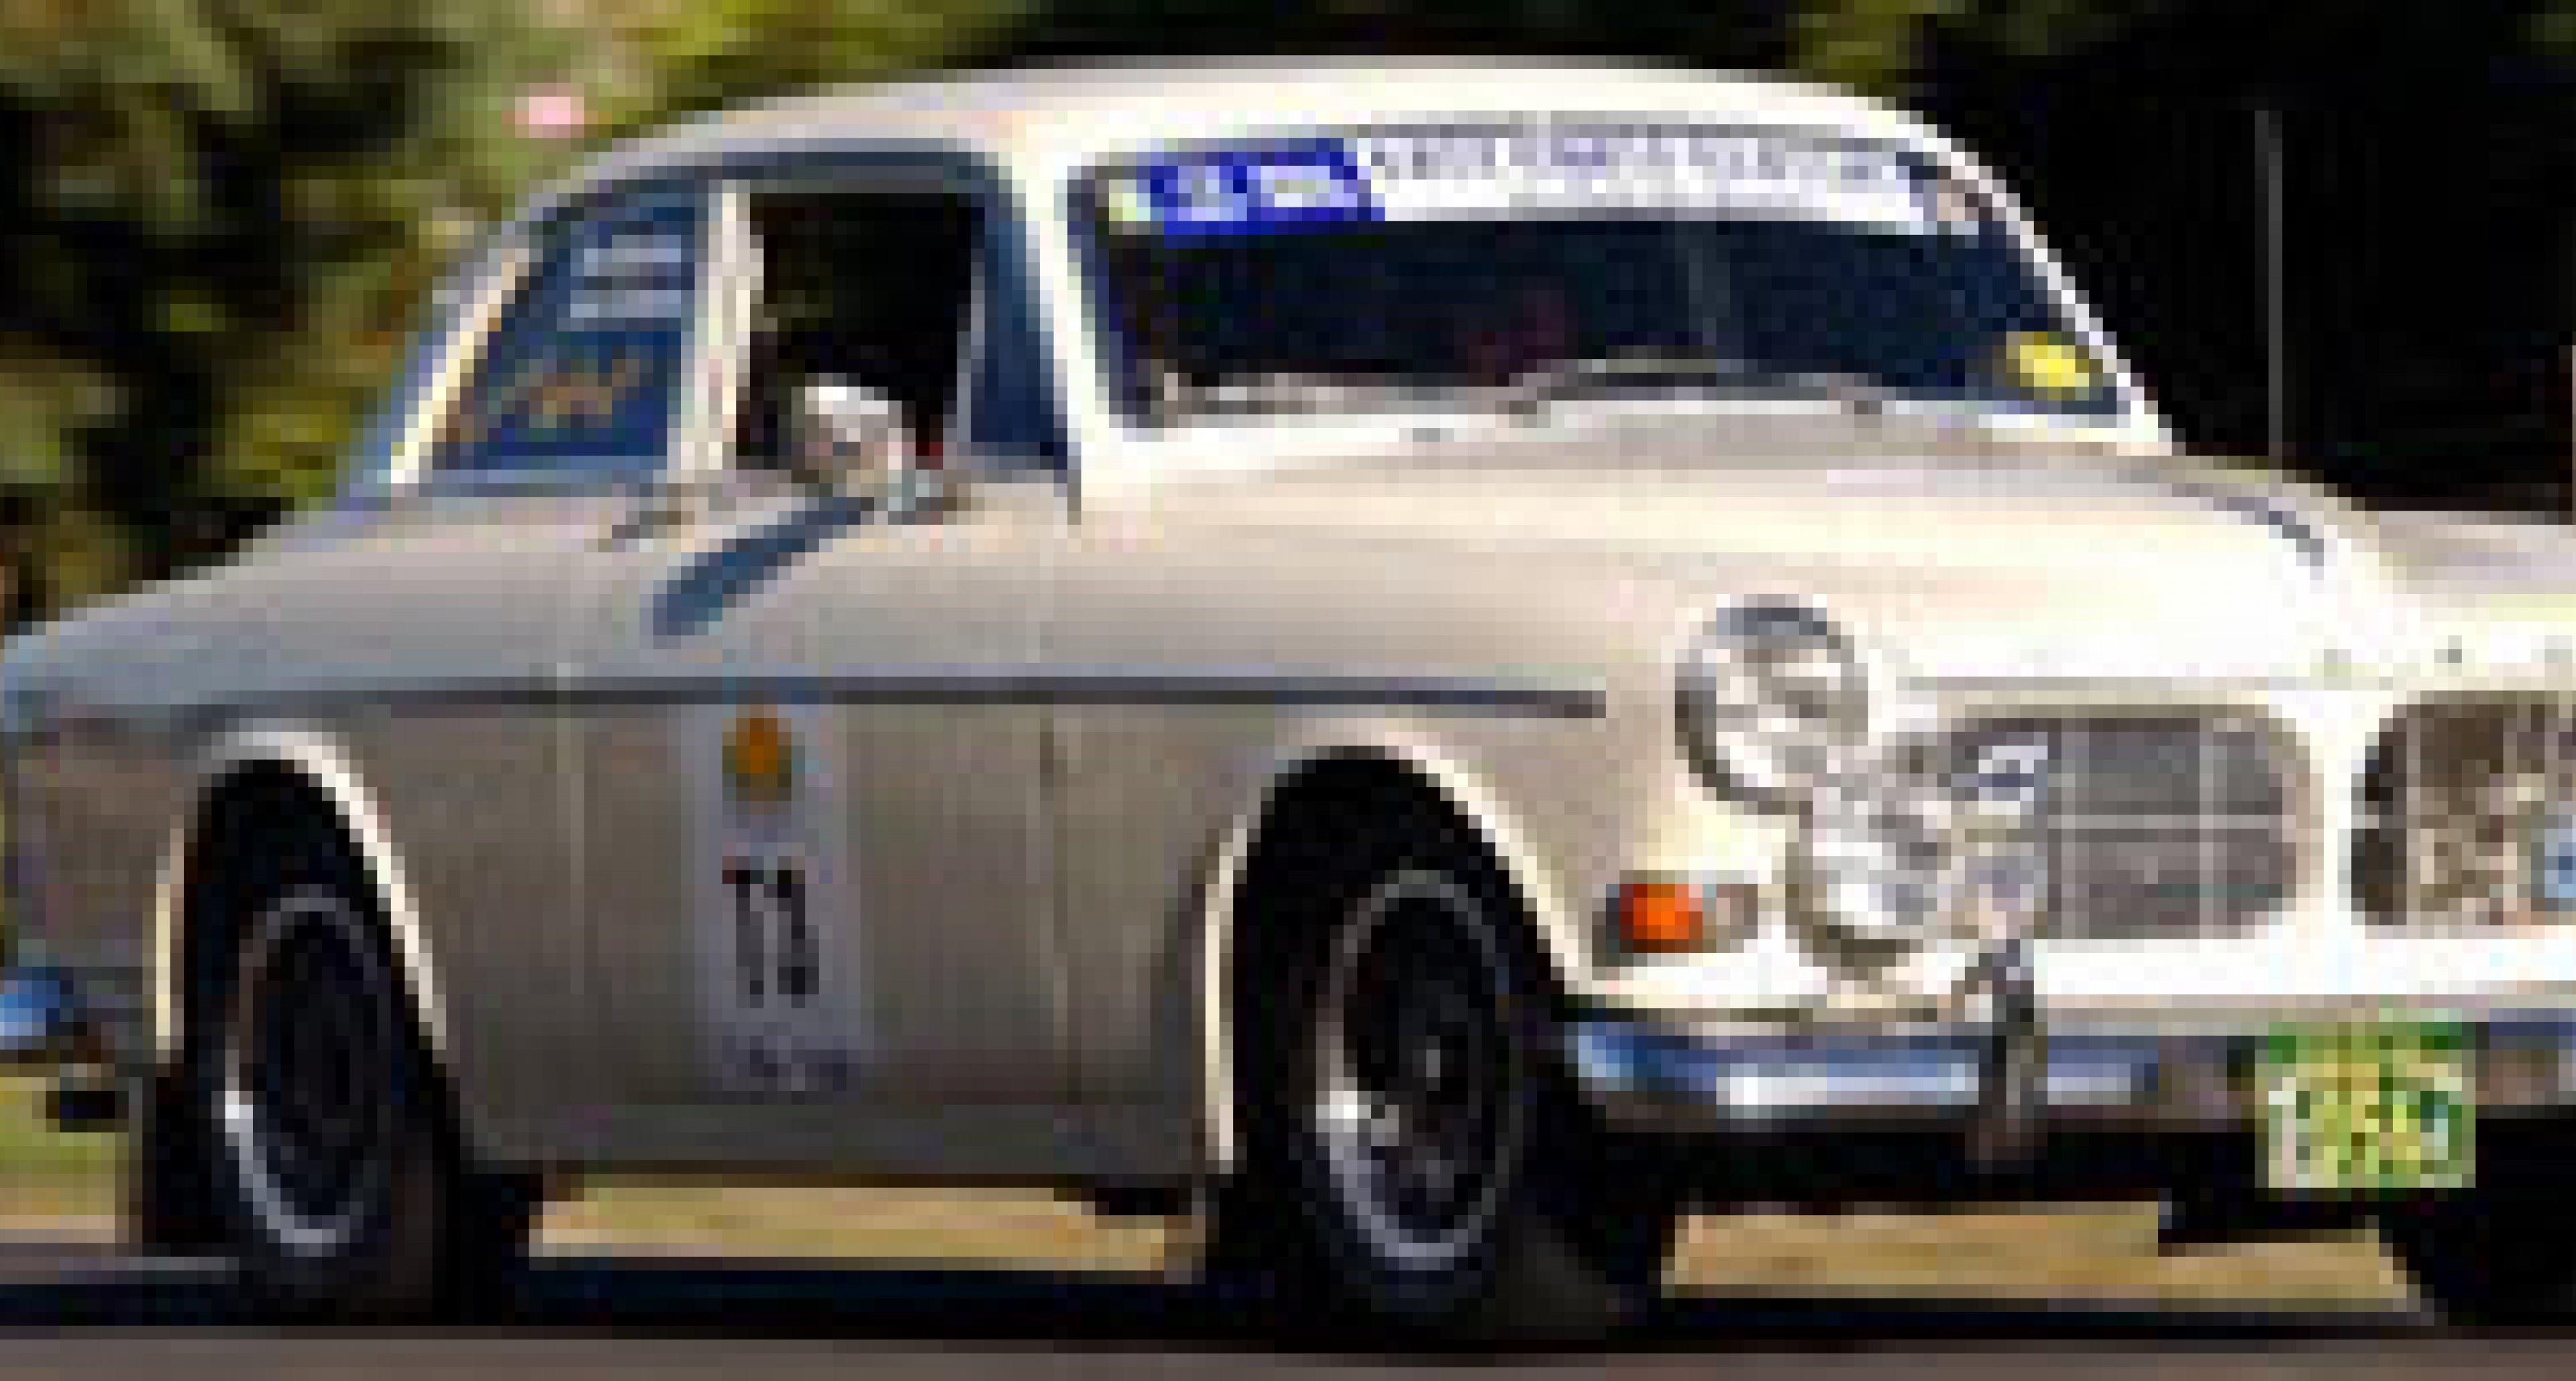 Kangaroos and Classic Cars